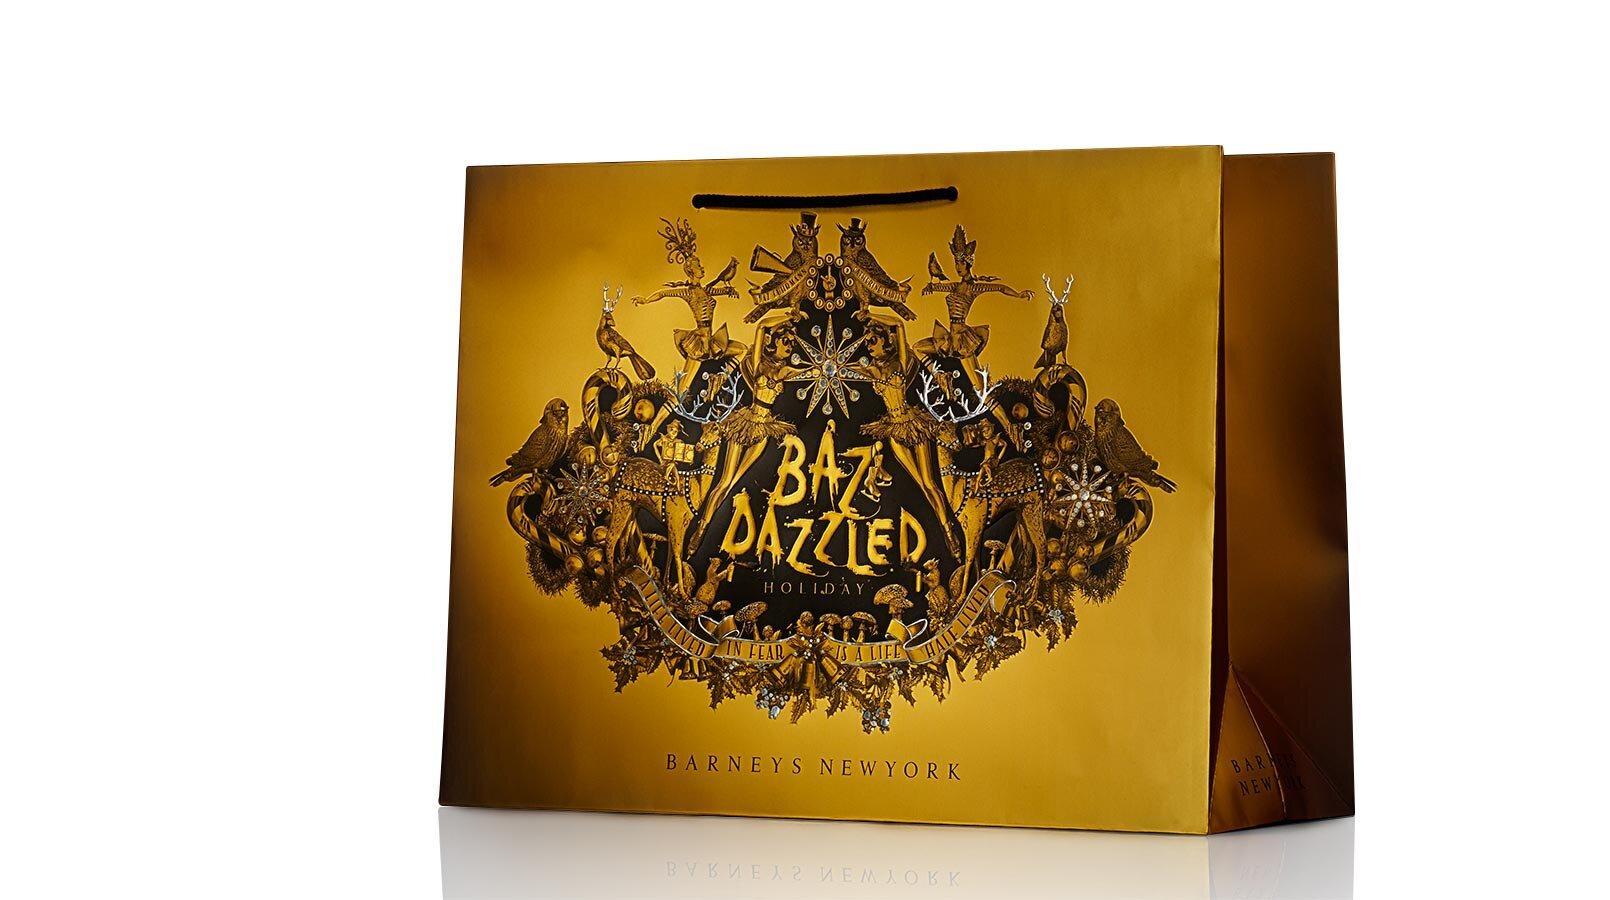 Barneys-New-York-Bazdazzled-Baz-Luhrmann-Packaging-Company-Design-5.jpg